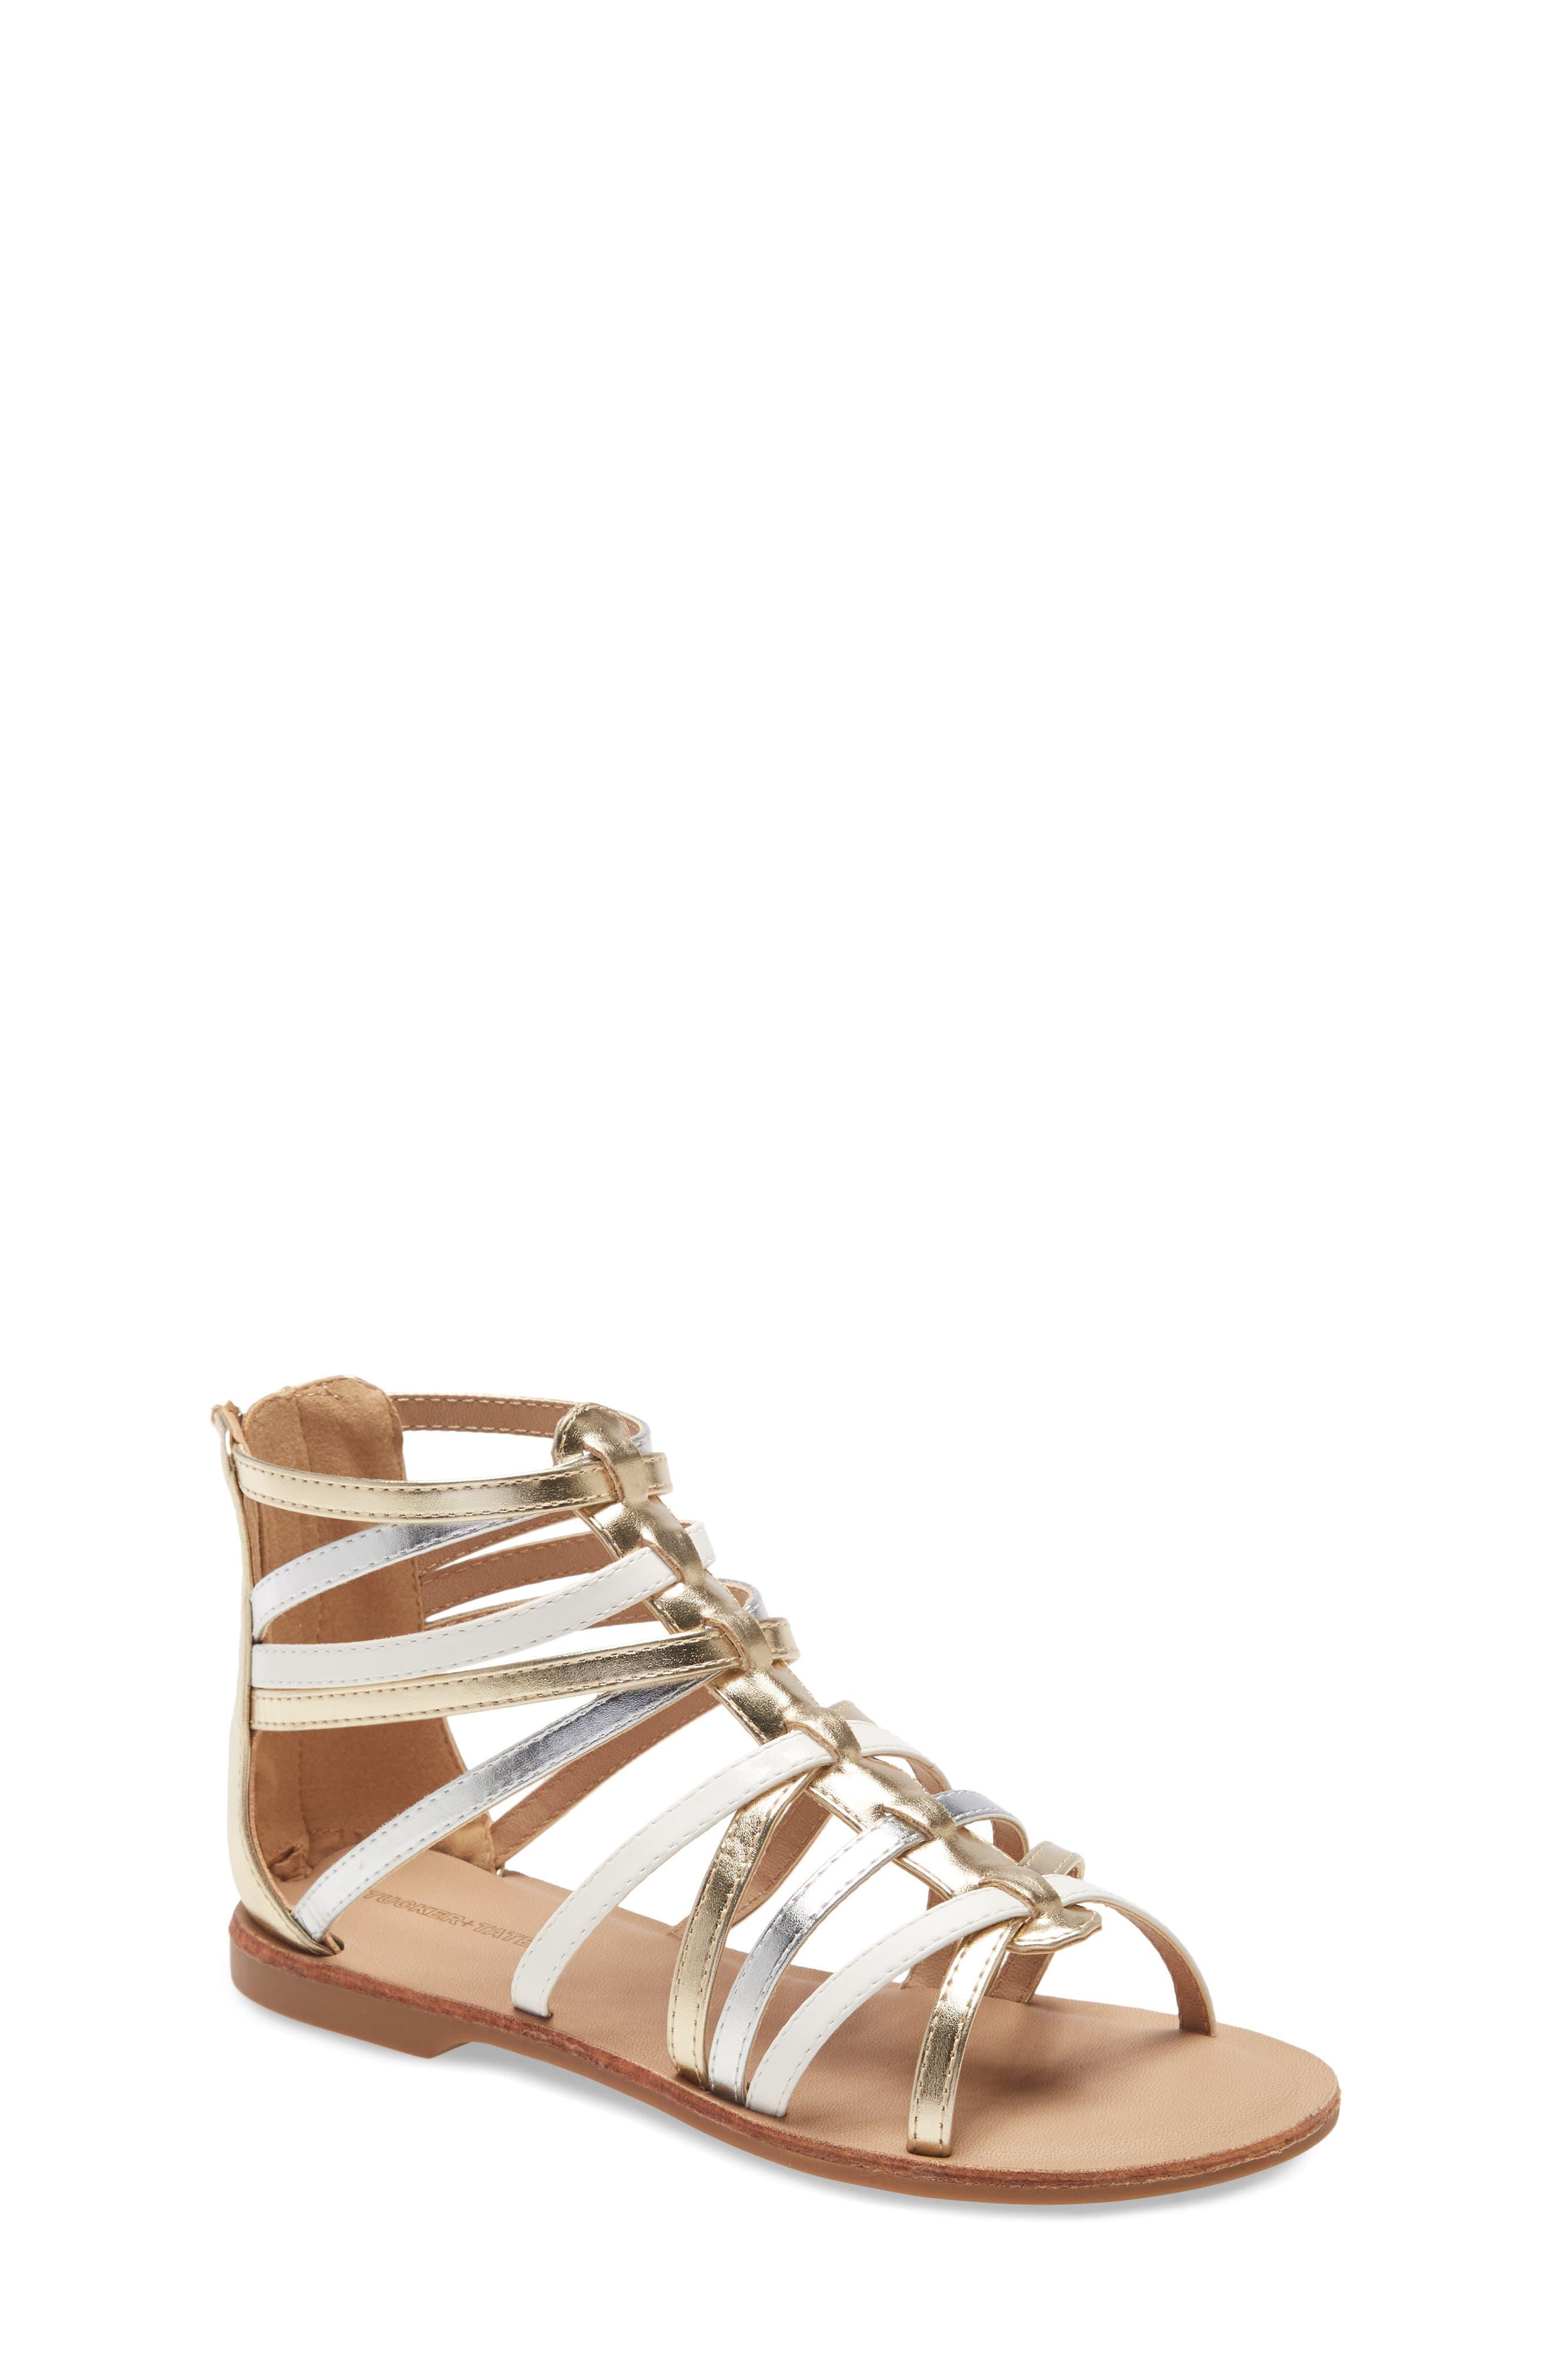 Image of Tucker + Tate Gladiator Sandal